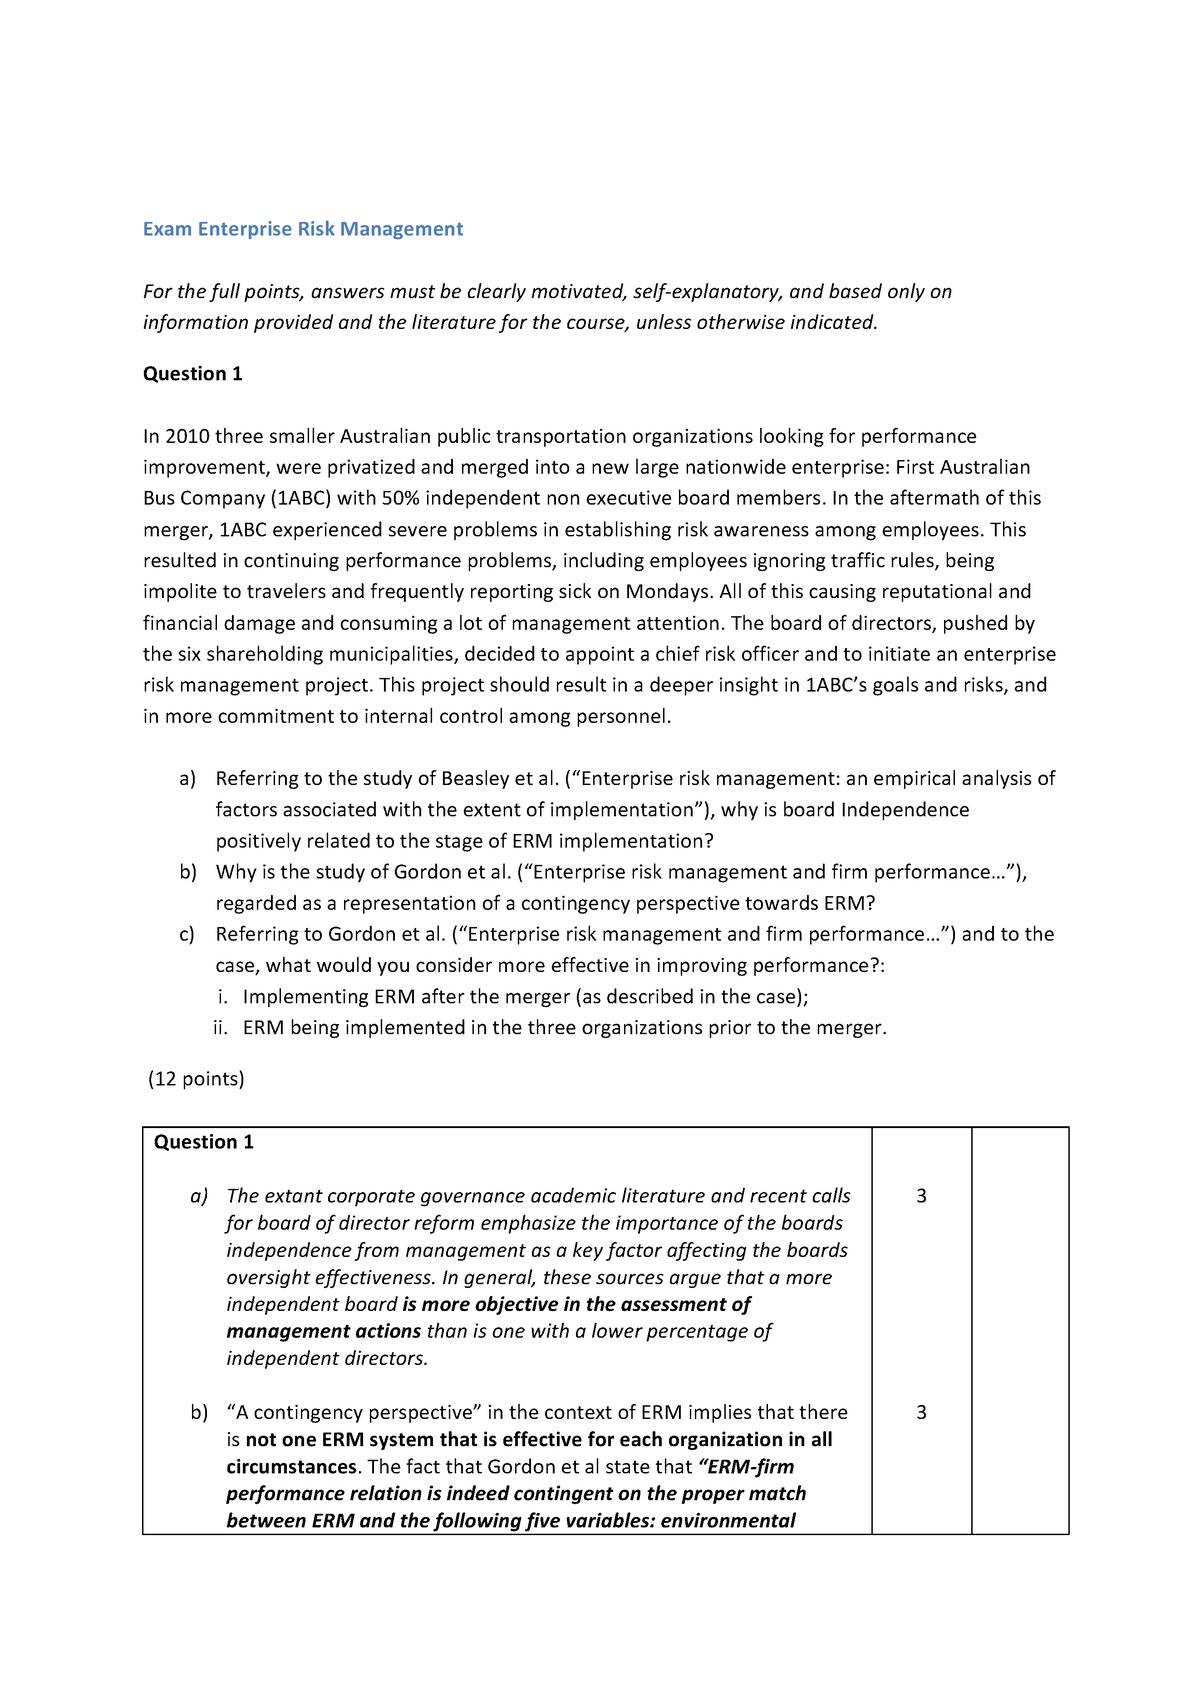 Tentamen 2017 - EBM157A05: Enterprise Risk Management - StudeerSnel nl